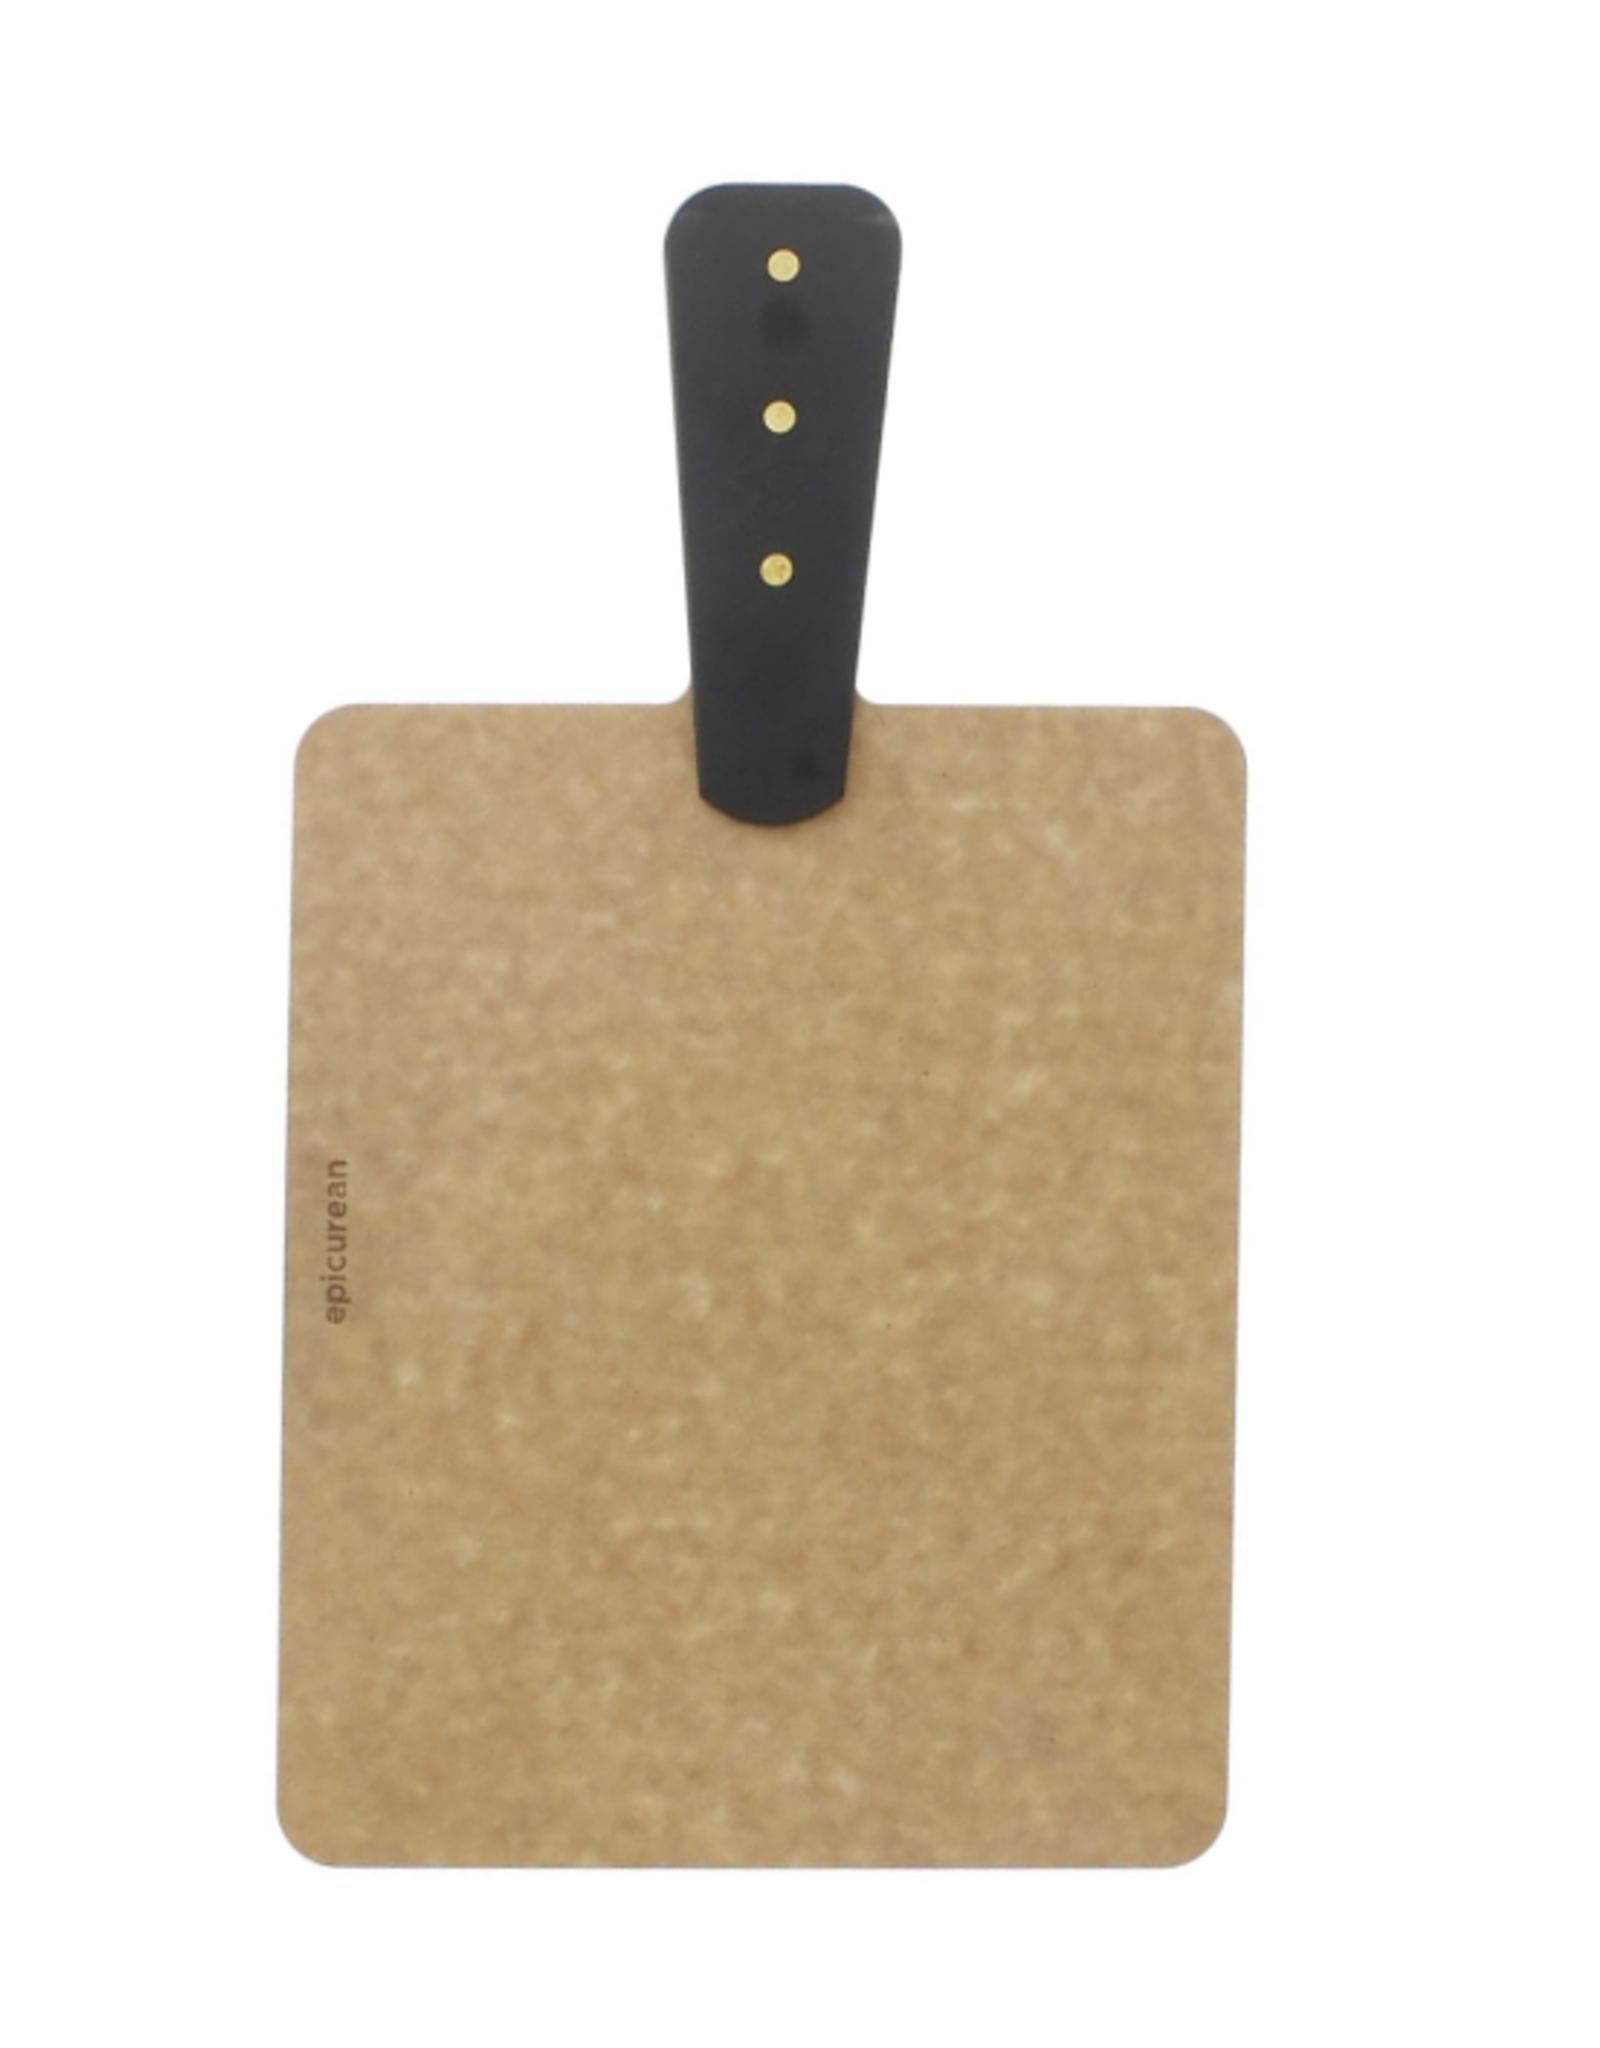 Epicurean Handy Boards, Riveted Handle, Natural/Slate 9x7.5